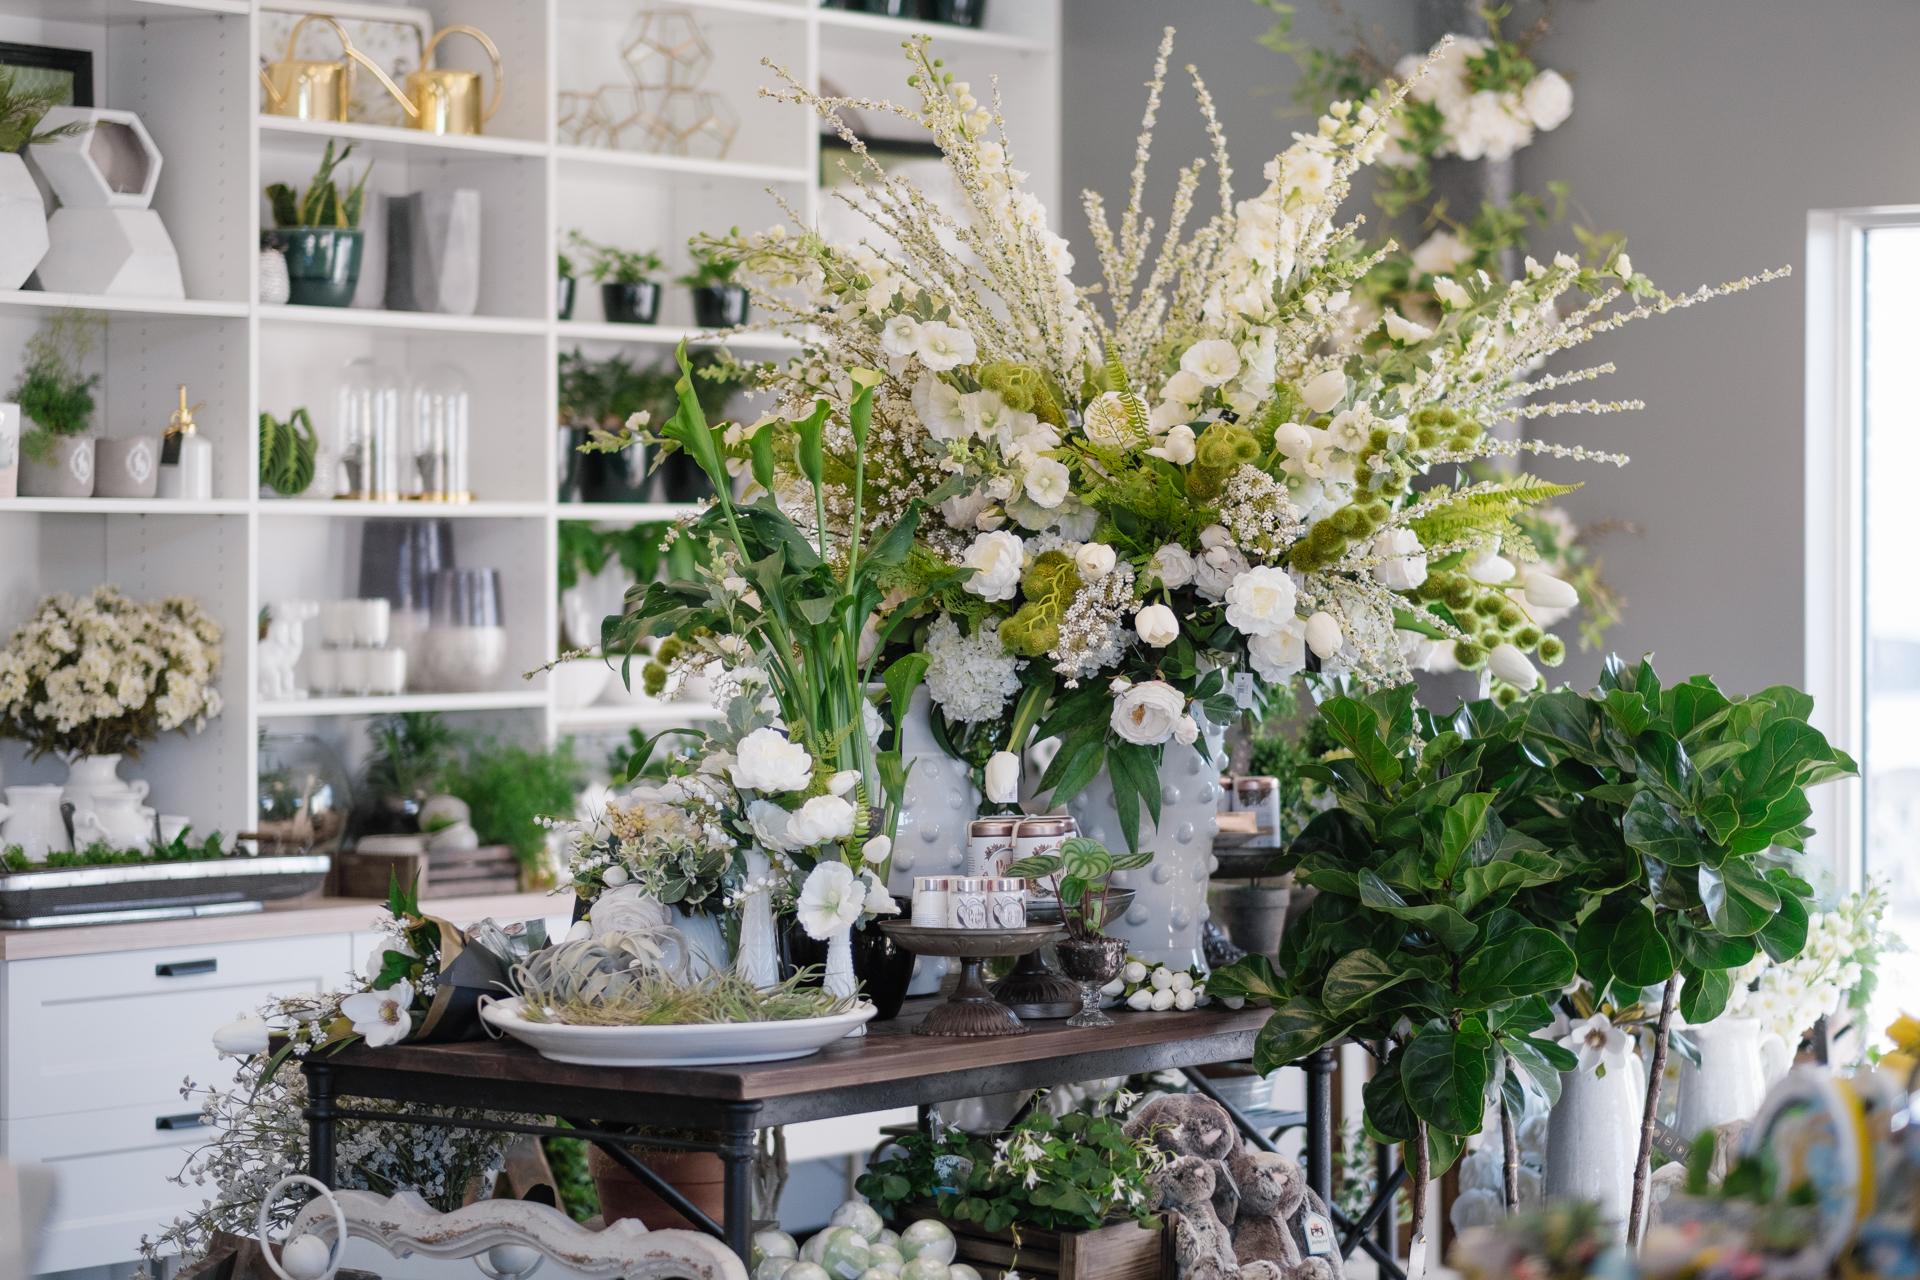 Wascana Flower Shoppe 2nd set of edits-18.jpg